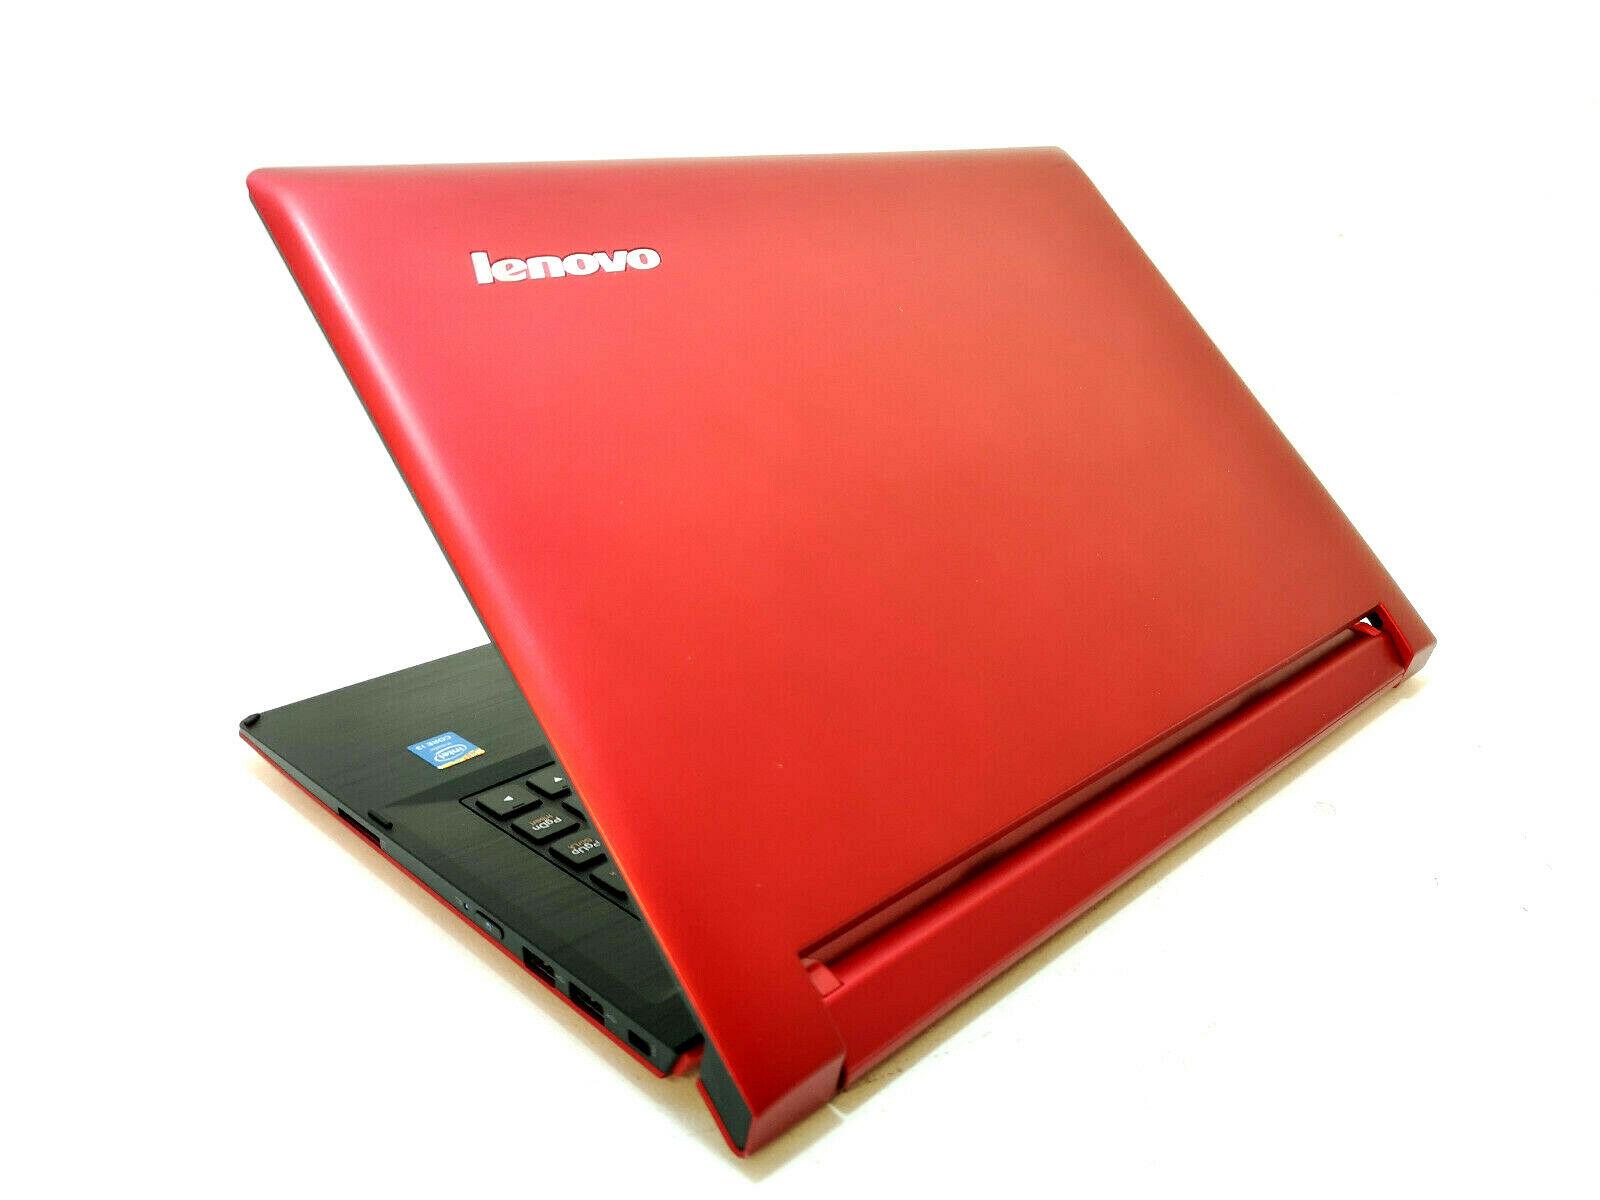 Lenovo-20404-Red - 140563